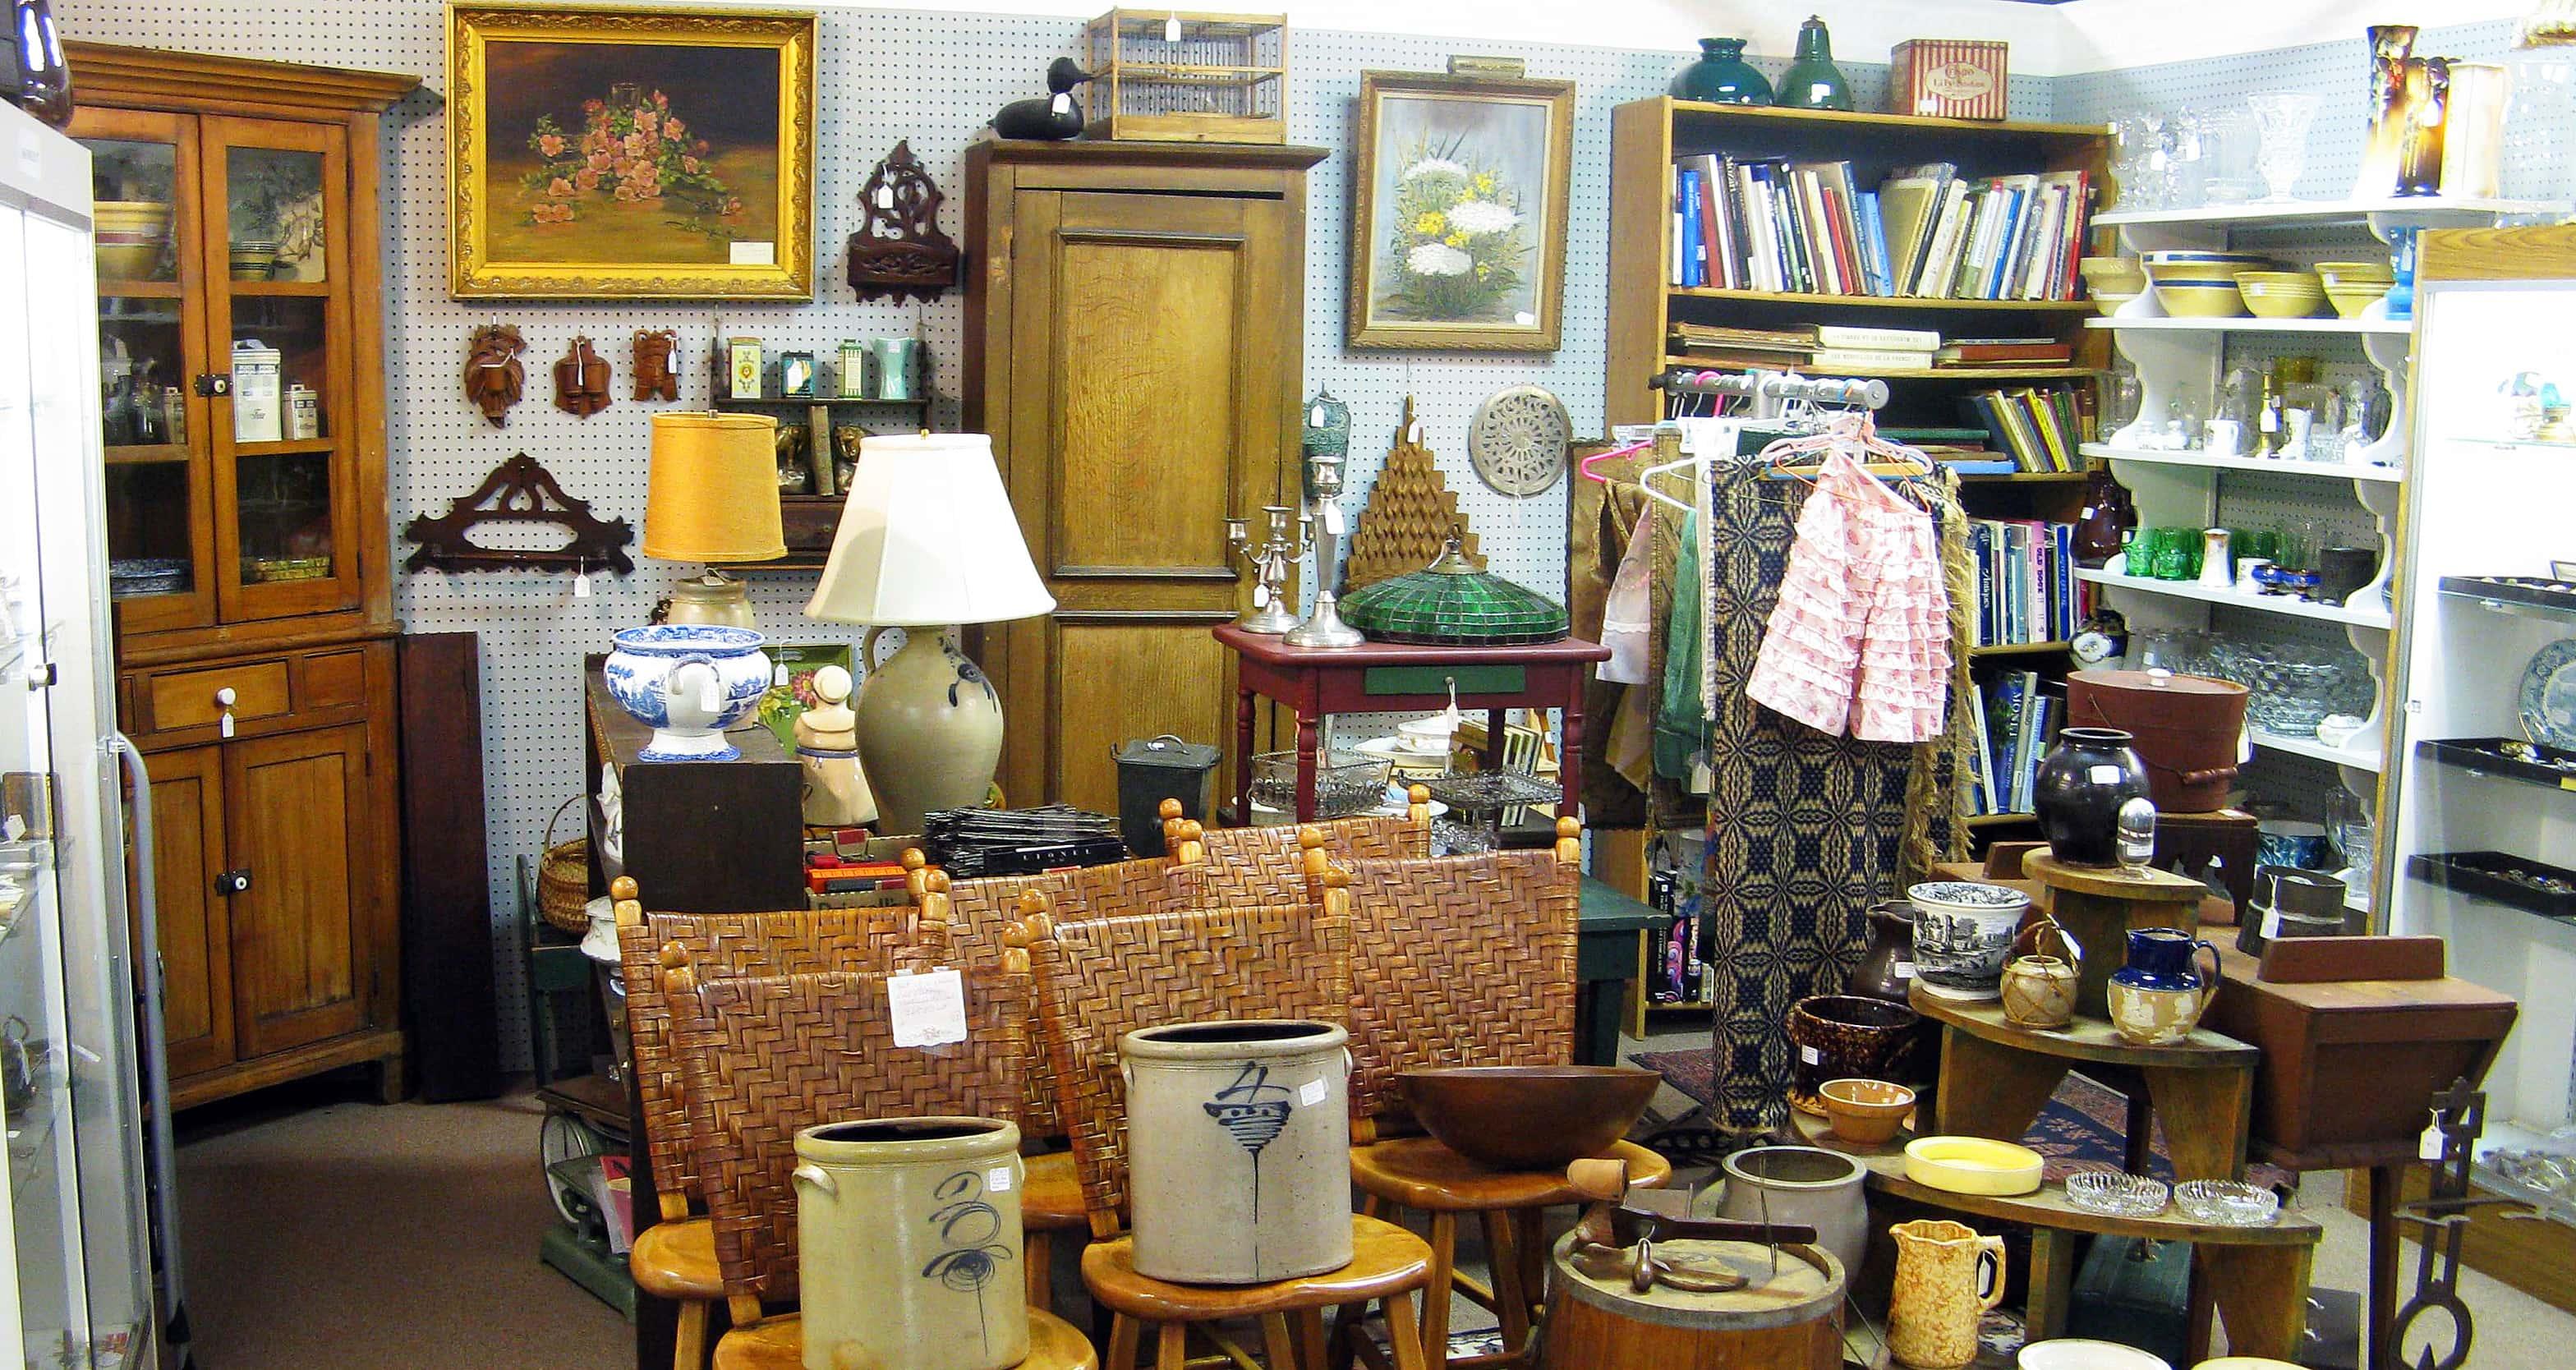 antique stores in michigan Ex Cop Retires to Run SW Michigan Antique Malls | Moody on the Market antique stores in michigan